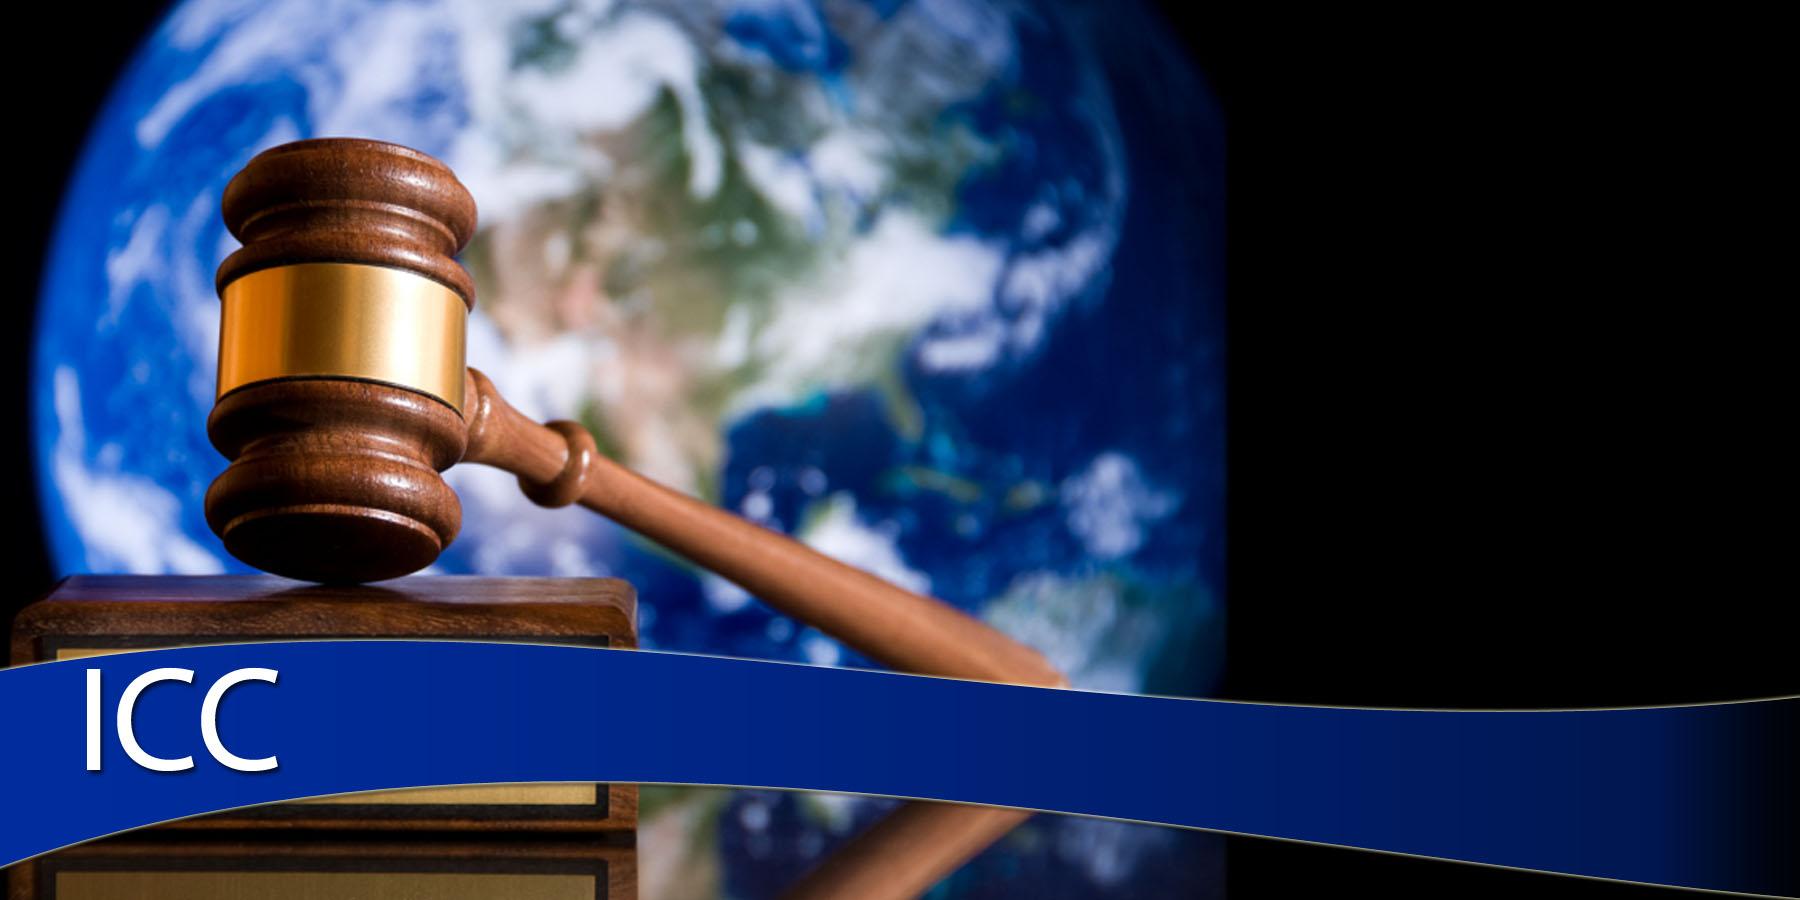 ... An Internship At The International Criminal Court (ICC) - CampusBee